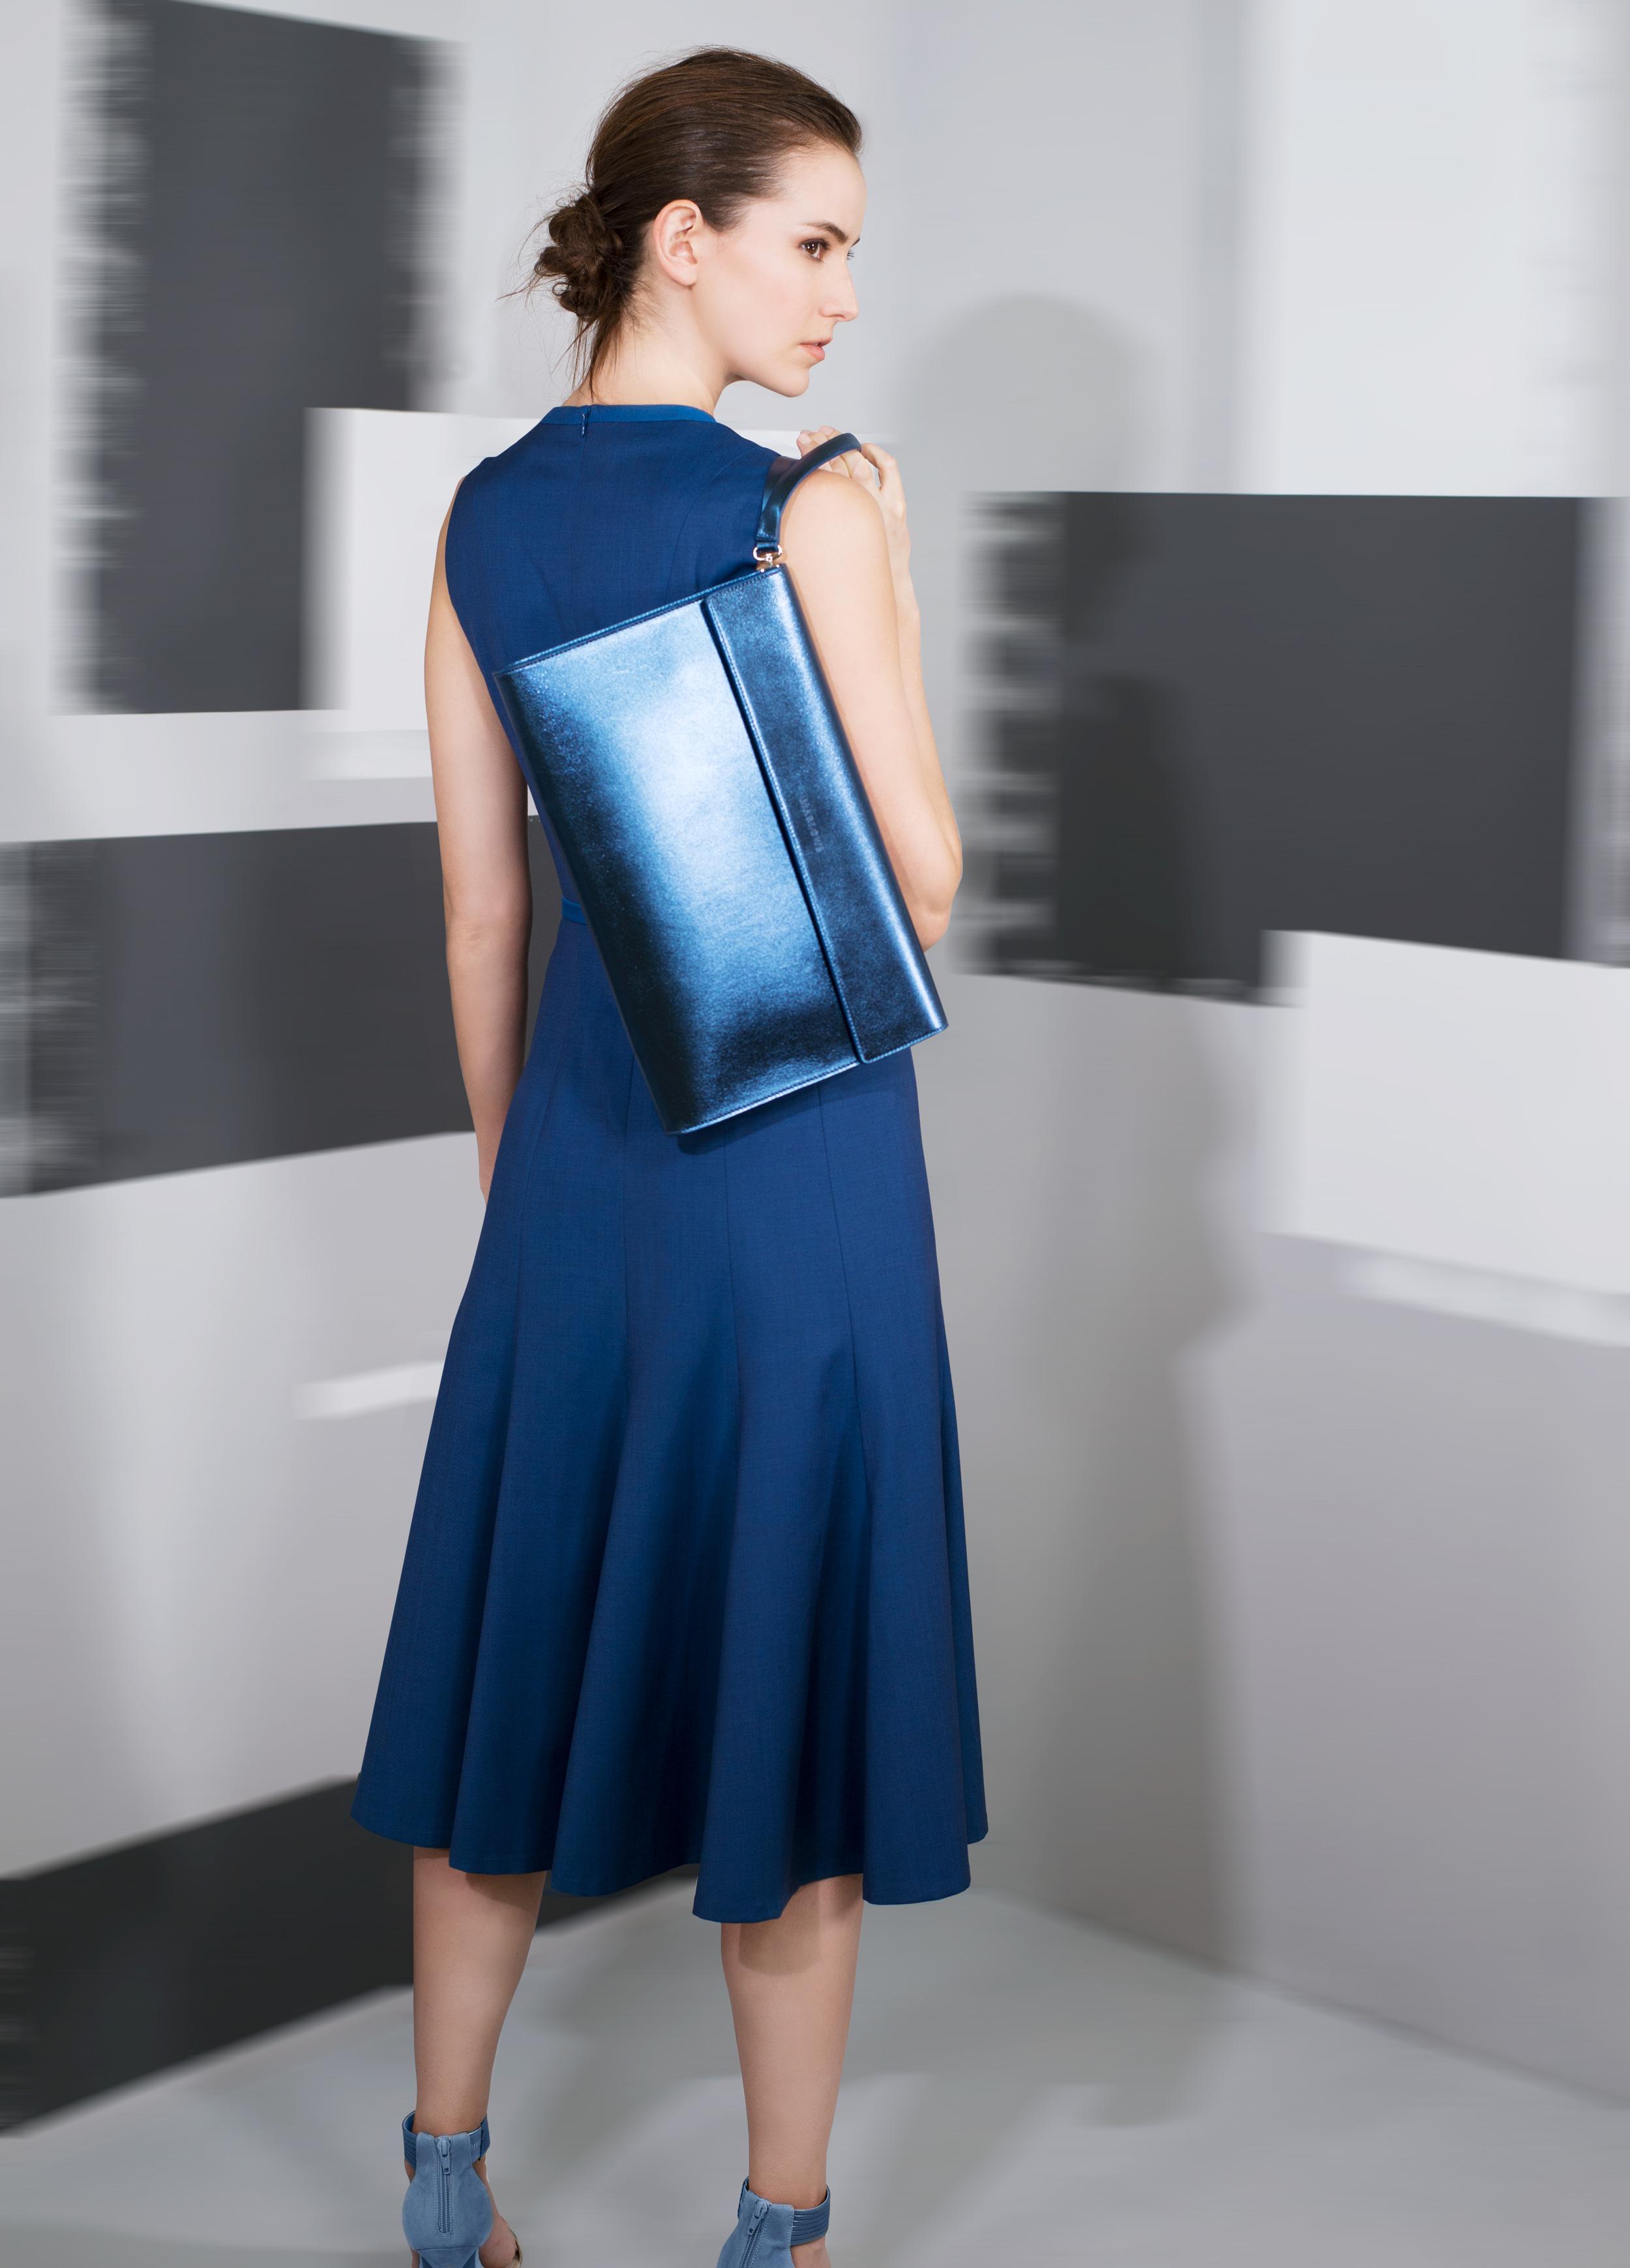 Soft comfort wool front pleated fluid hemline and banding trim dress  black pearl enameled teal blue amber mercury blue   Metallic calf-skin single handle clutch